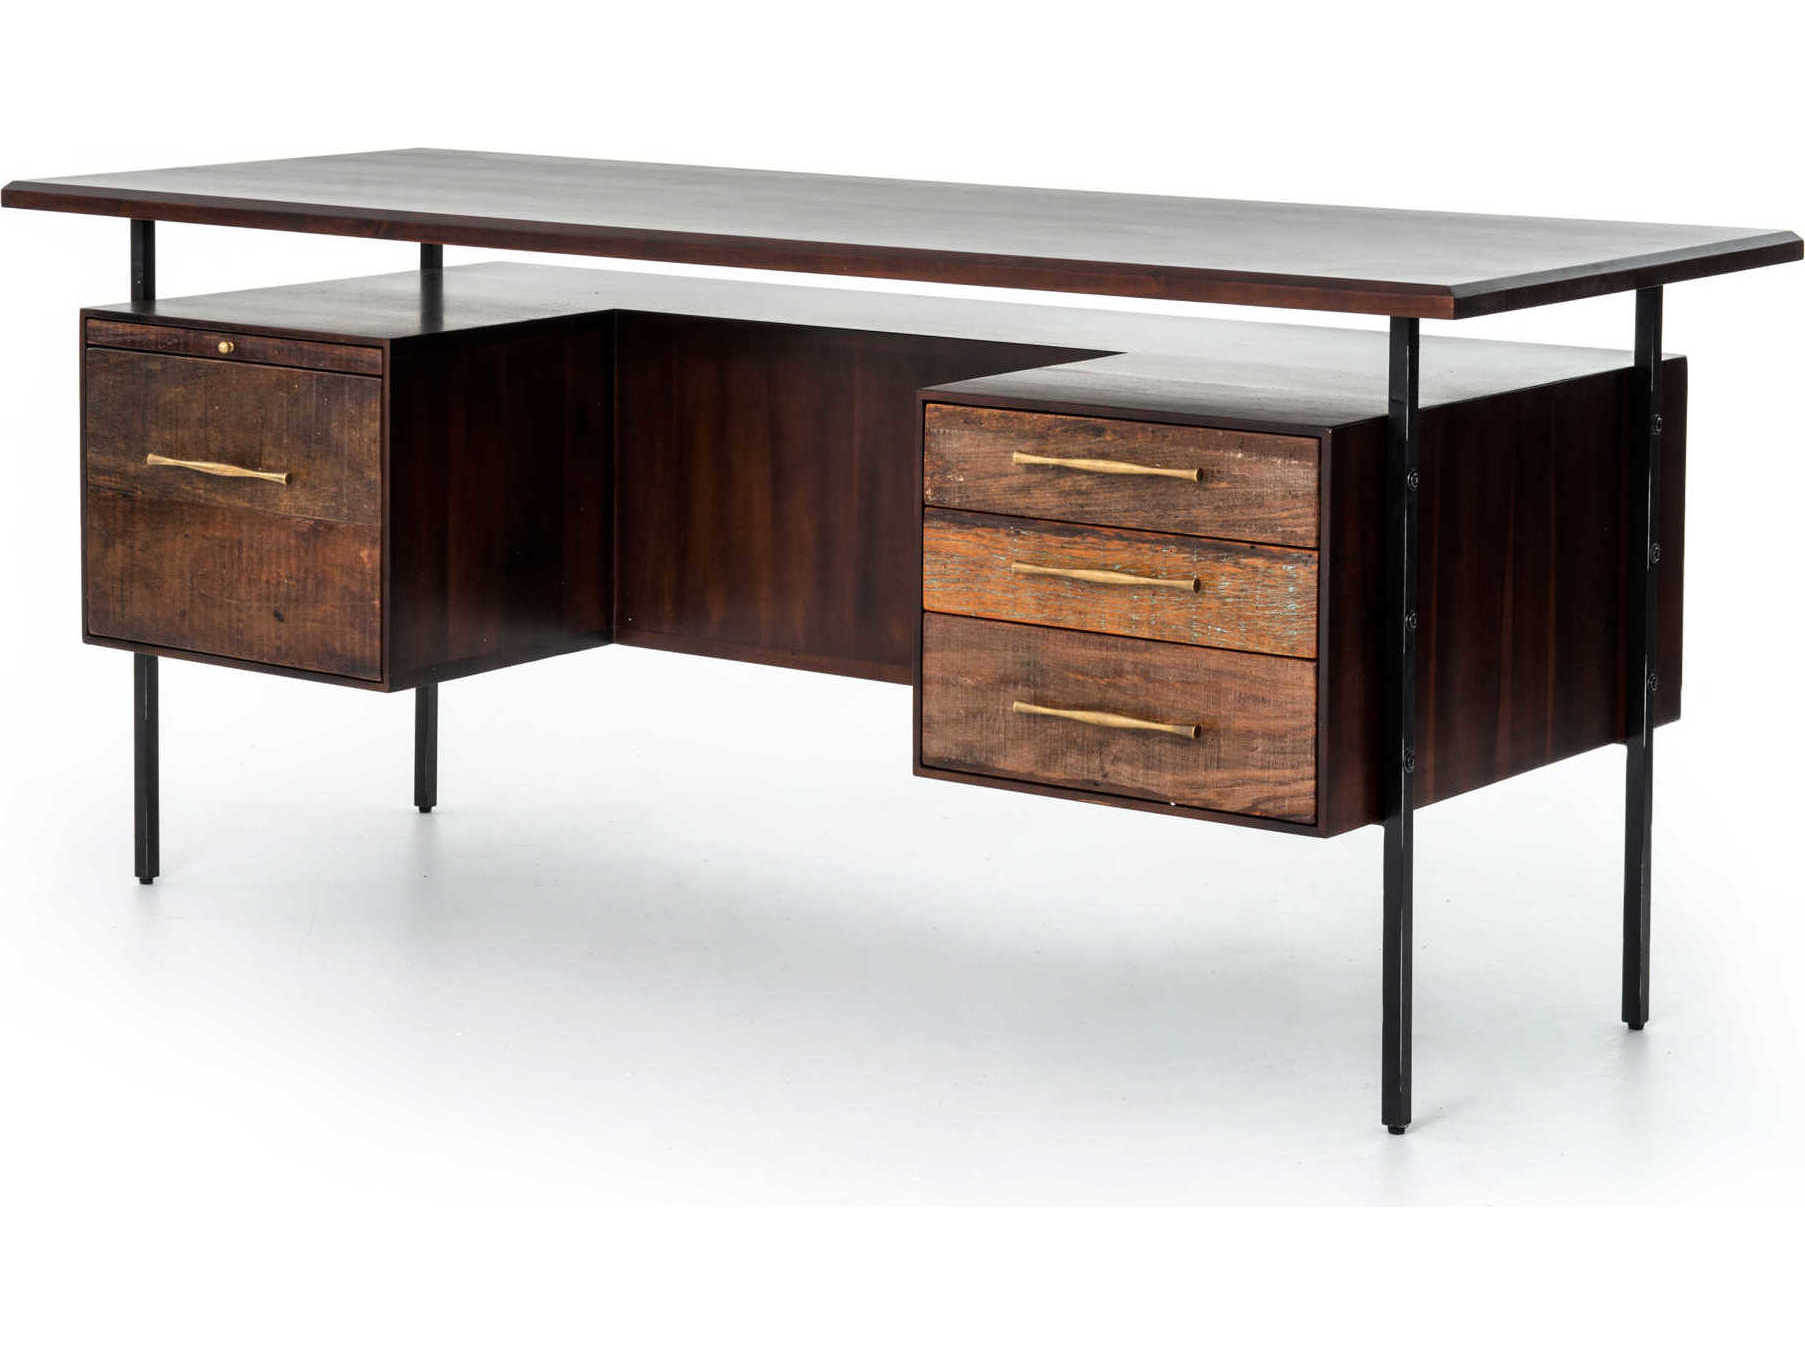 Rustic Americana Hardwood Executive Desk Home Office: Four Hands Bina Warm Brown Acacia / Natural Peroba Black